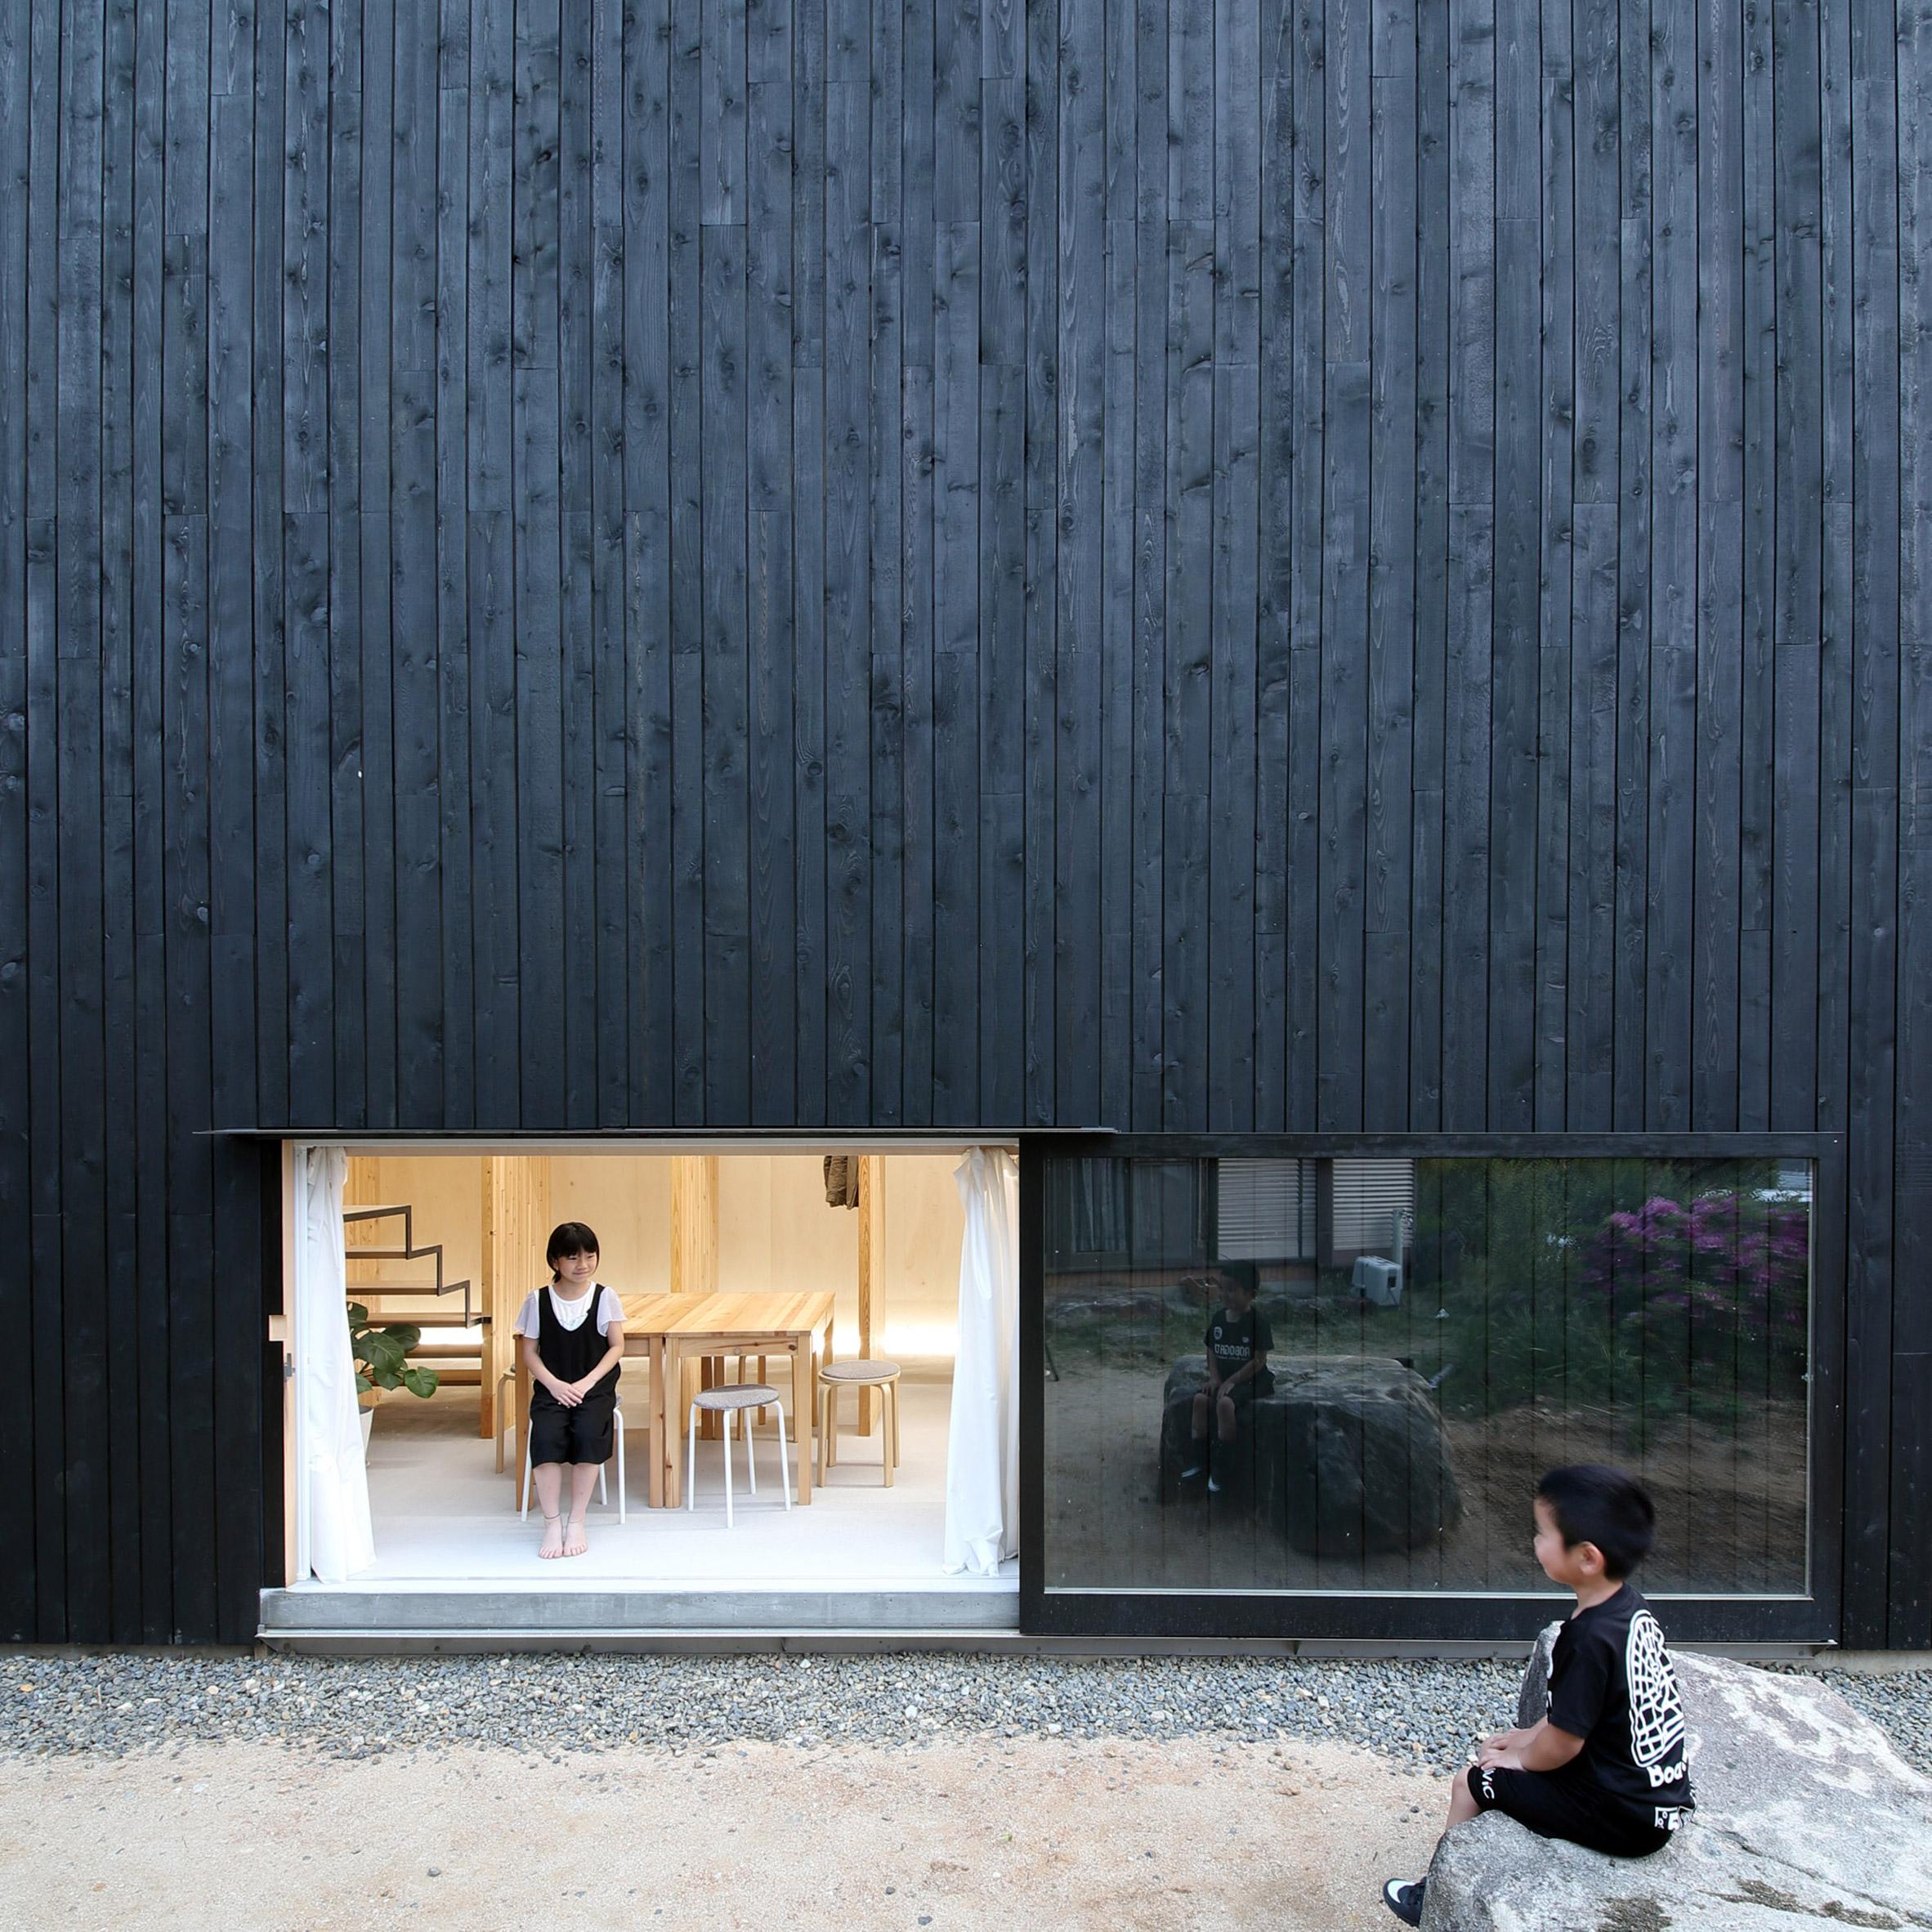 Dezeen's top 10 houses of 2018: T Noie, Japan, by Katsutoshi Sasaki + Associates